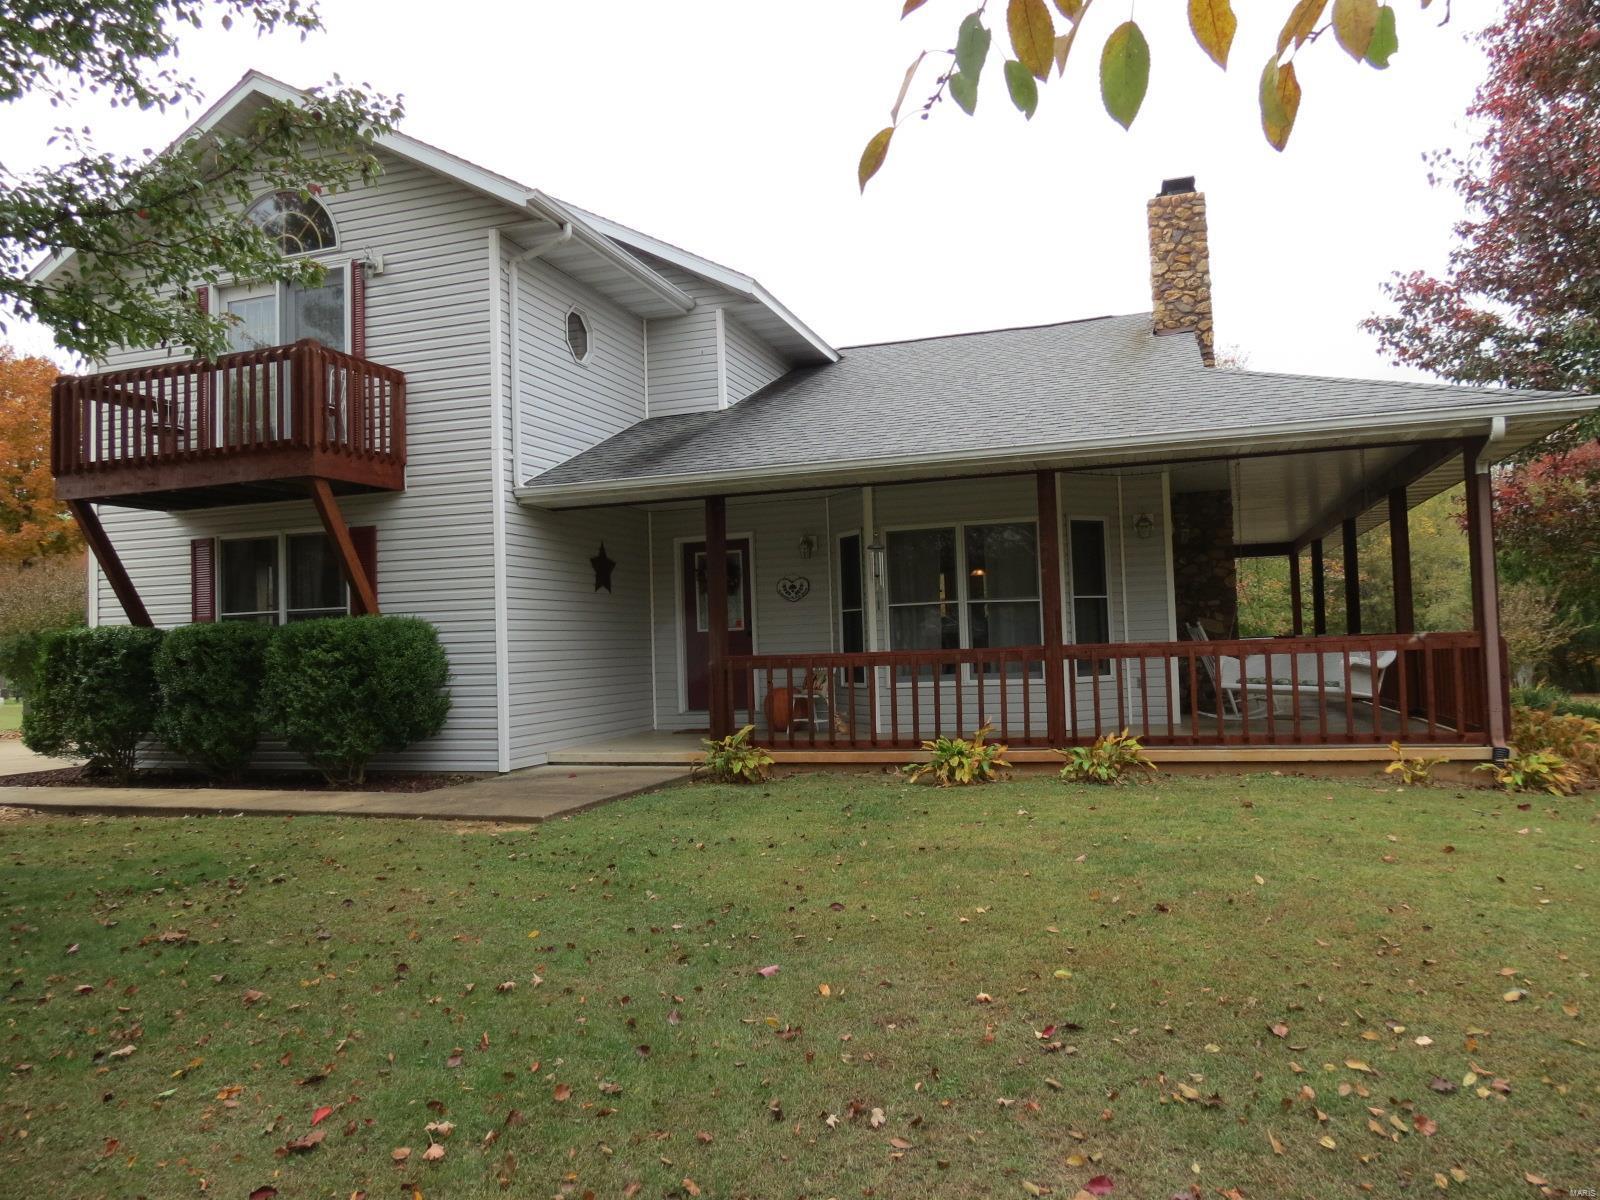 120 W Orchard Property Photo - Arcadia, MO real estate listing